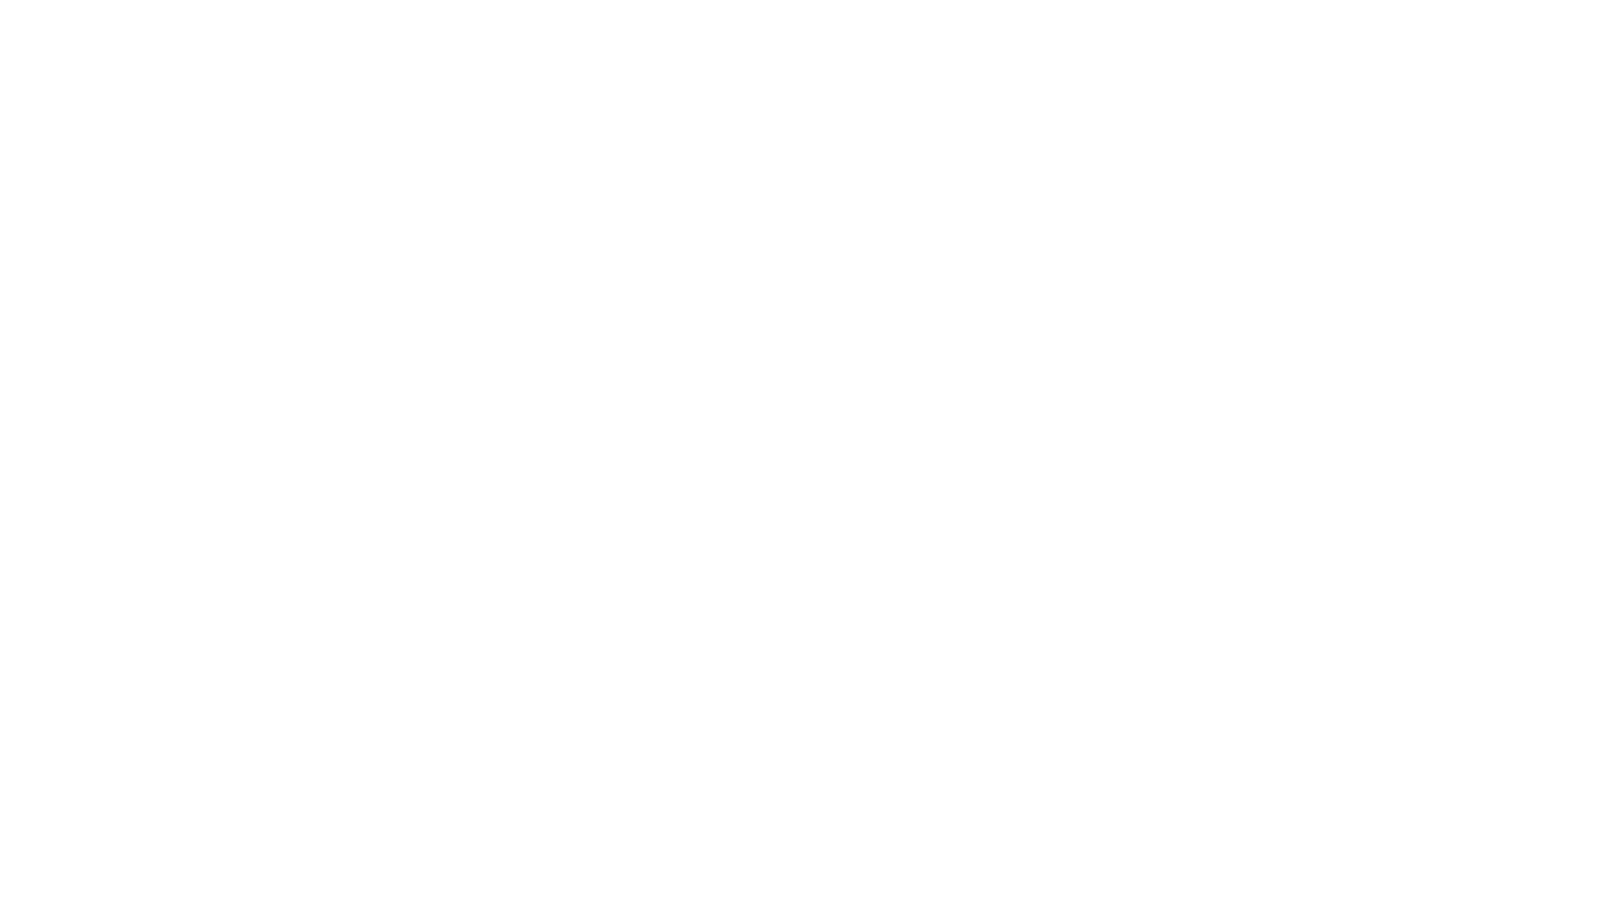 Gainlab Audio - EMPRESS 2x3 Band Tube Equalizer Demo Sound Samples https://gainlabaudio.com/empress-2x3-band-tube-equalizer/